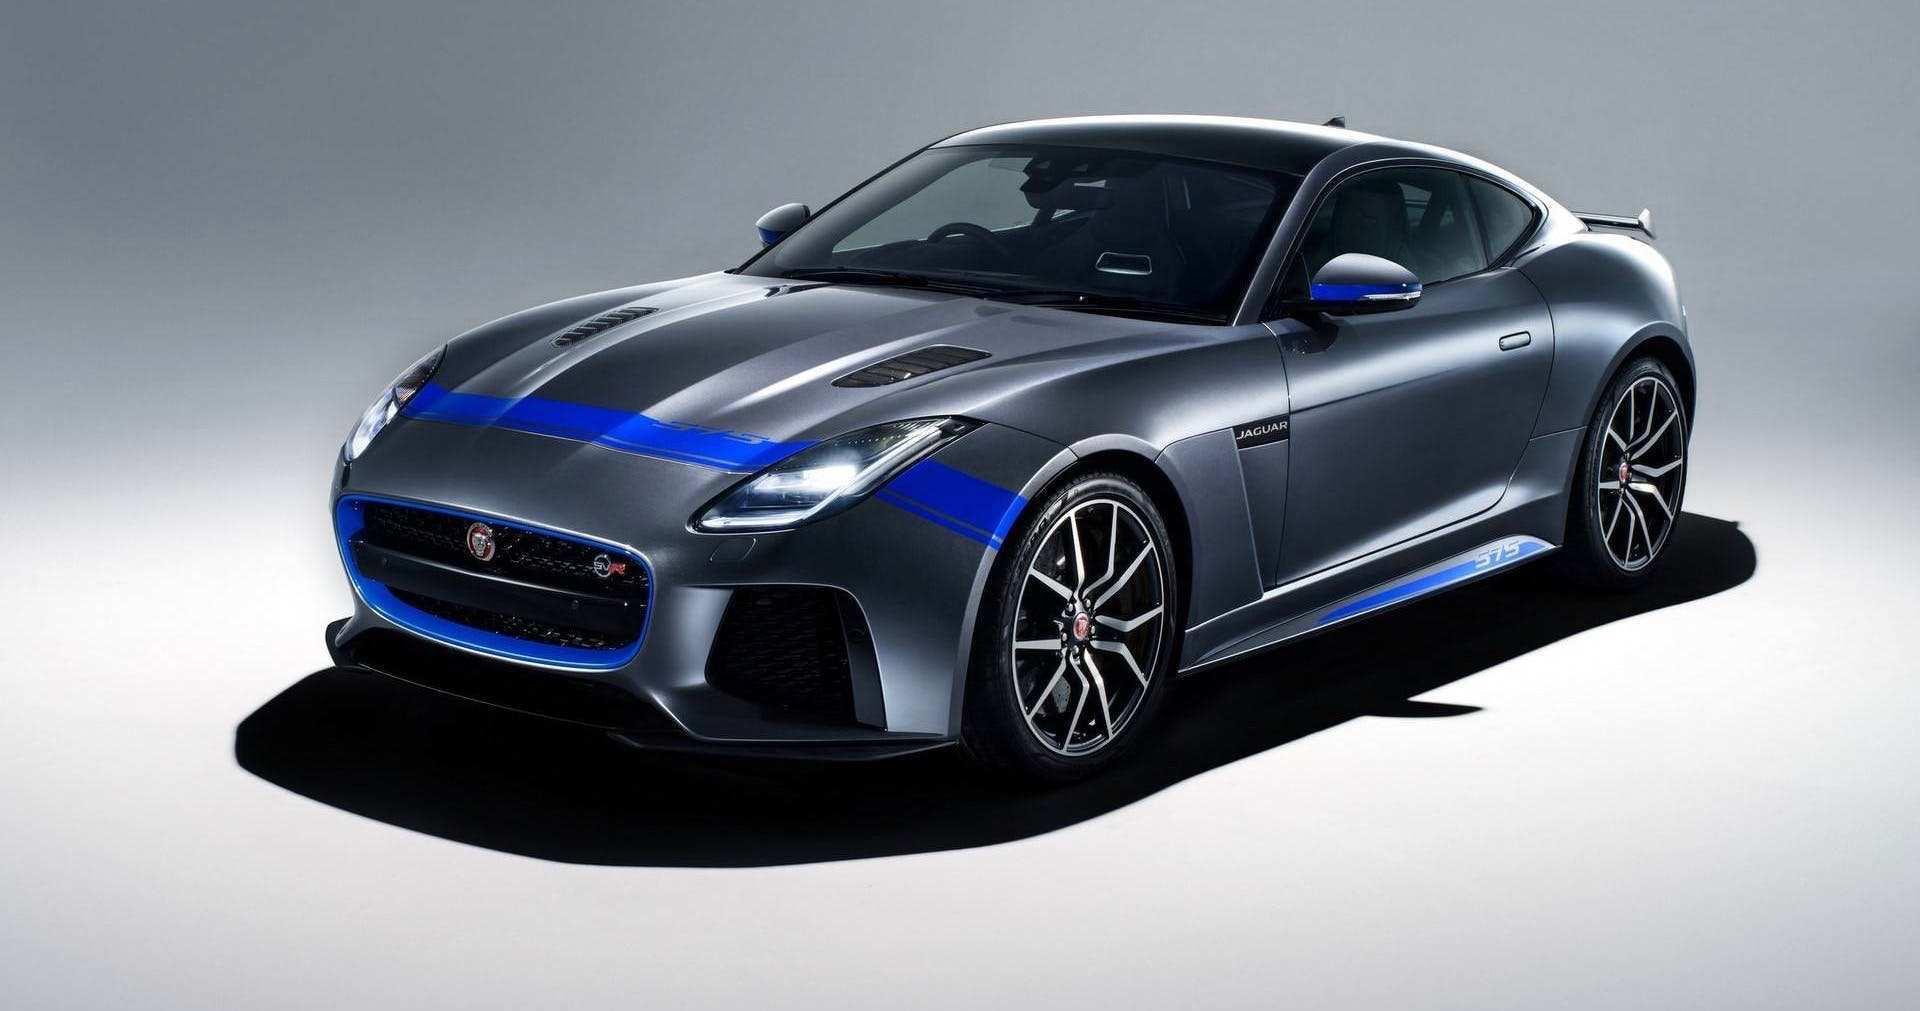 28 Great Jaguar Sports Car 2020 Specs and Review for Jaguar Sports Car 2020